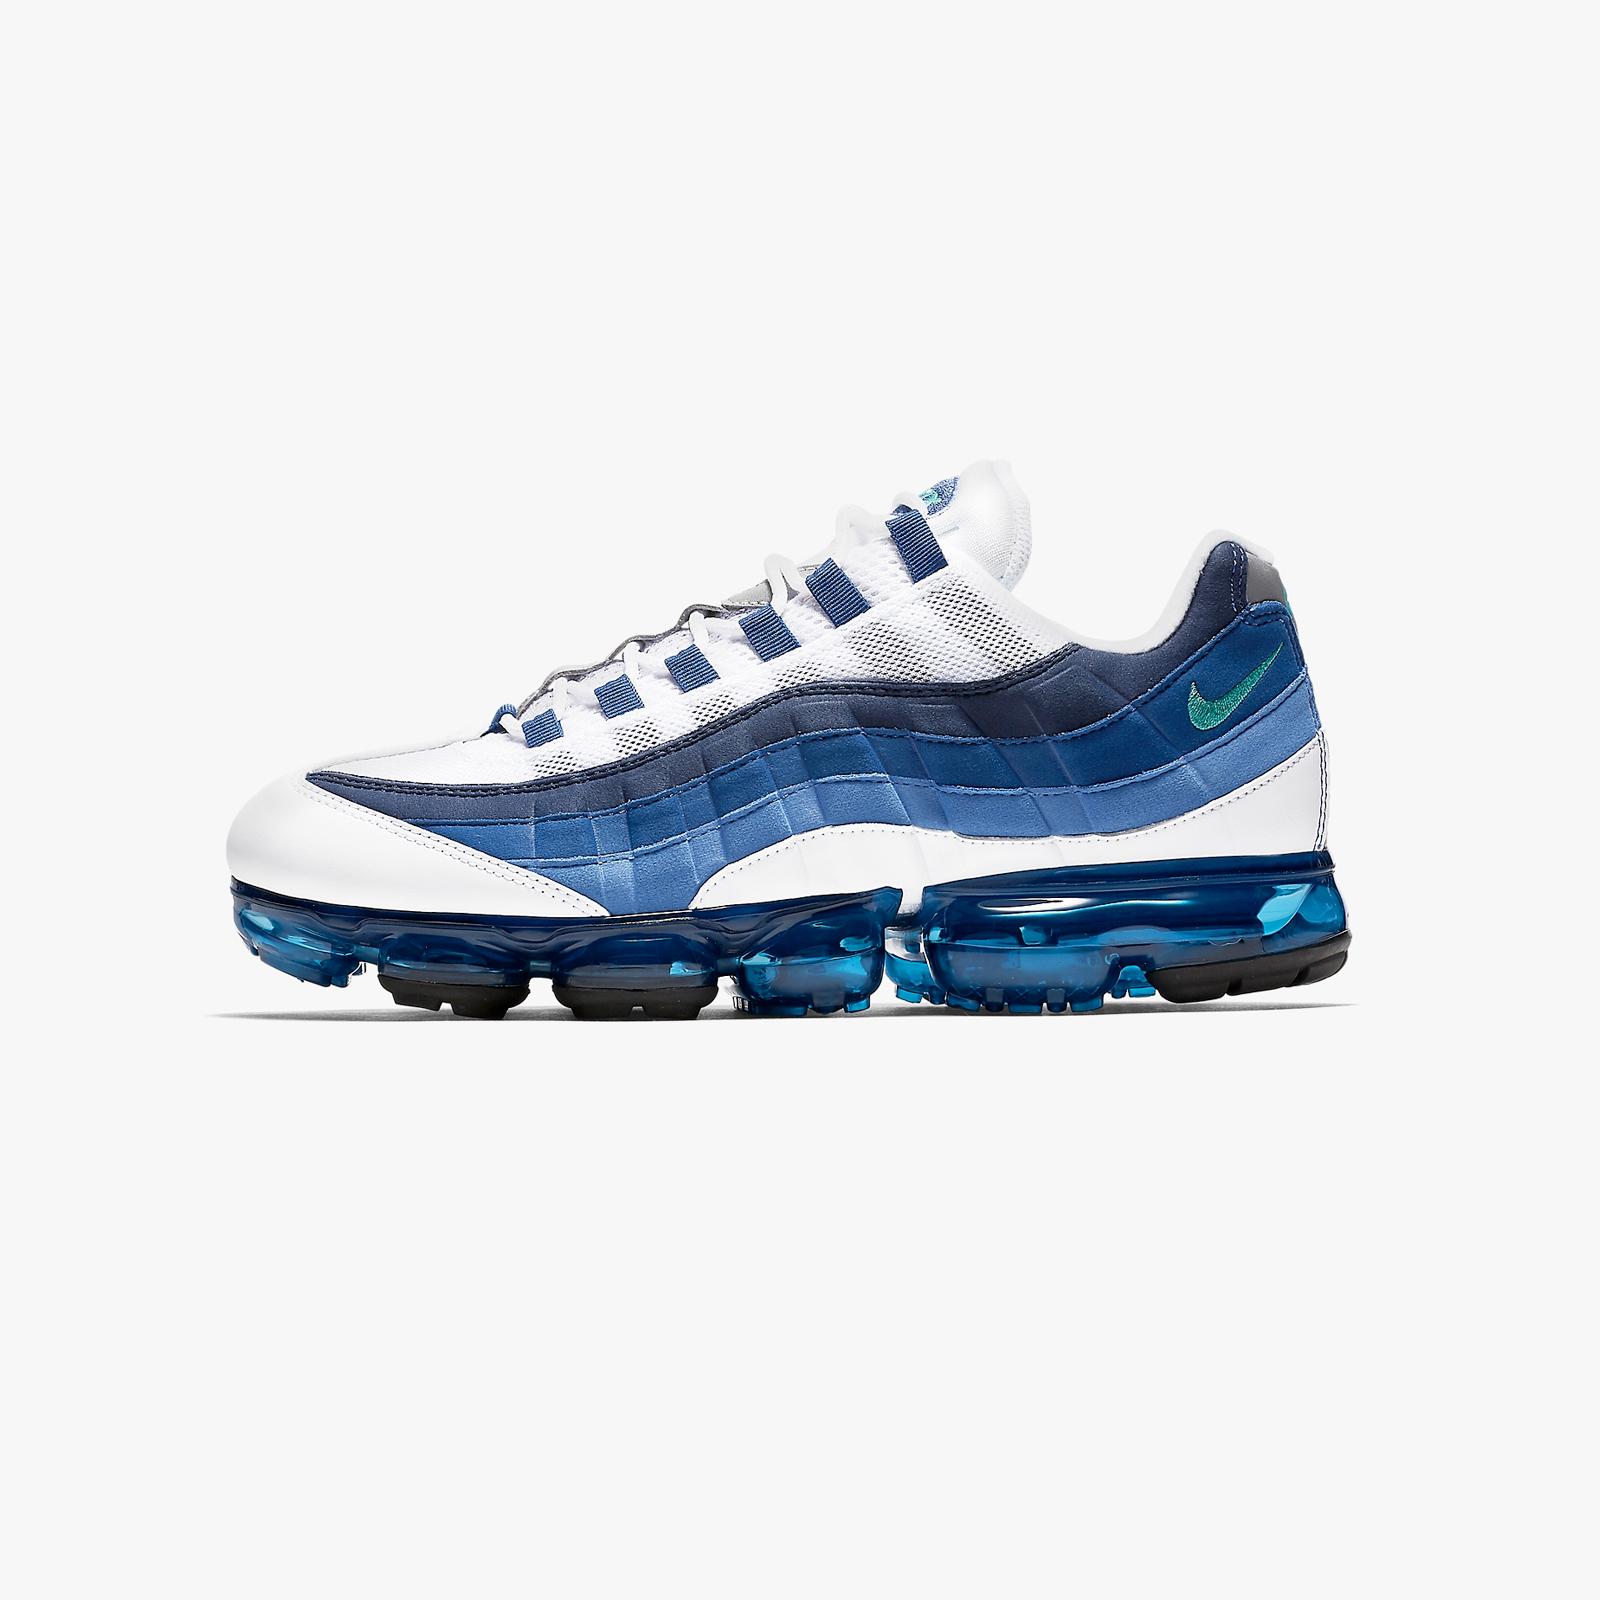 quality design 49570 4f7bd Nike Air Vapormax 95 - Aj7292-100 - Sneakersnstuff   sneakers & streetwear  online since 1999